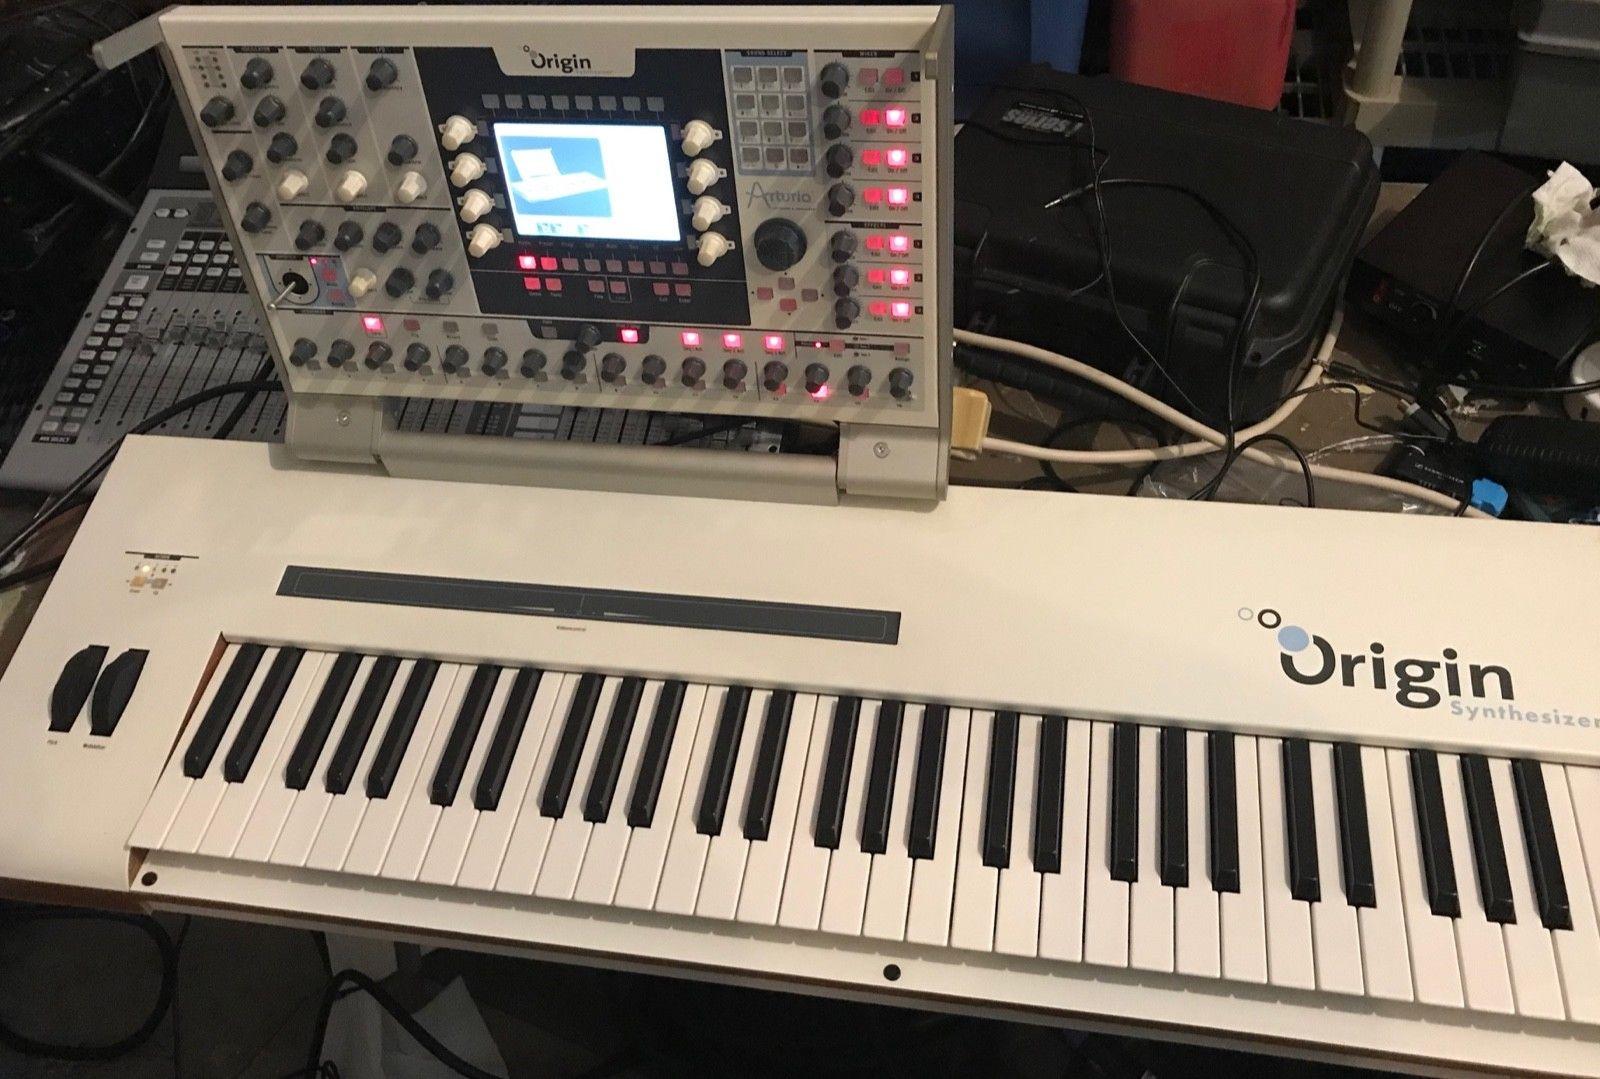 MATRIXSYNTH: Arturia Origin Keyboard, virtual hardware software